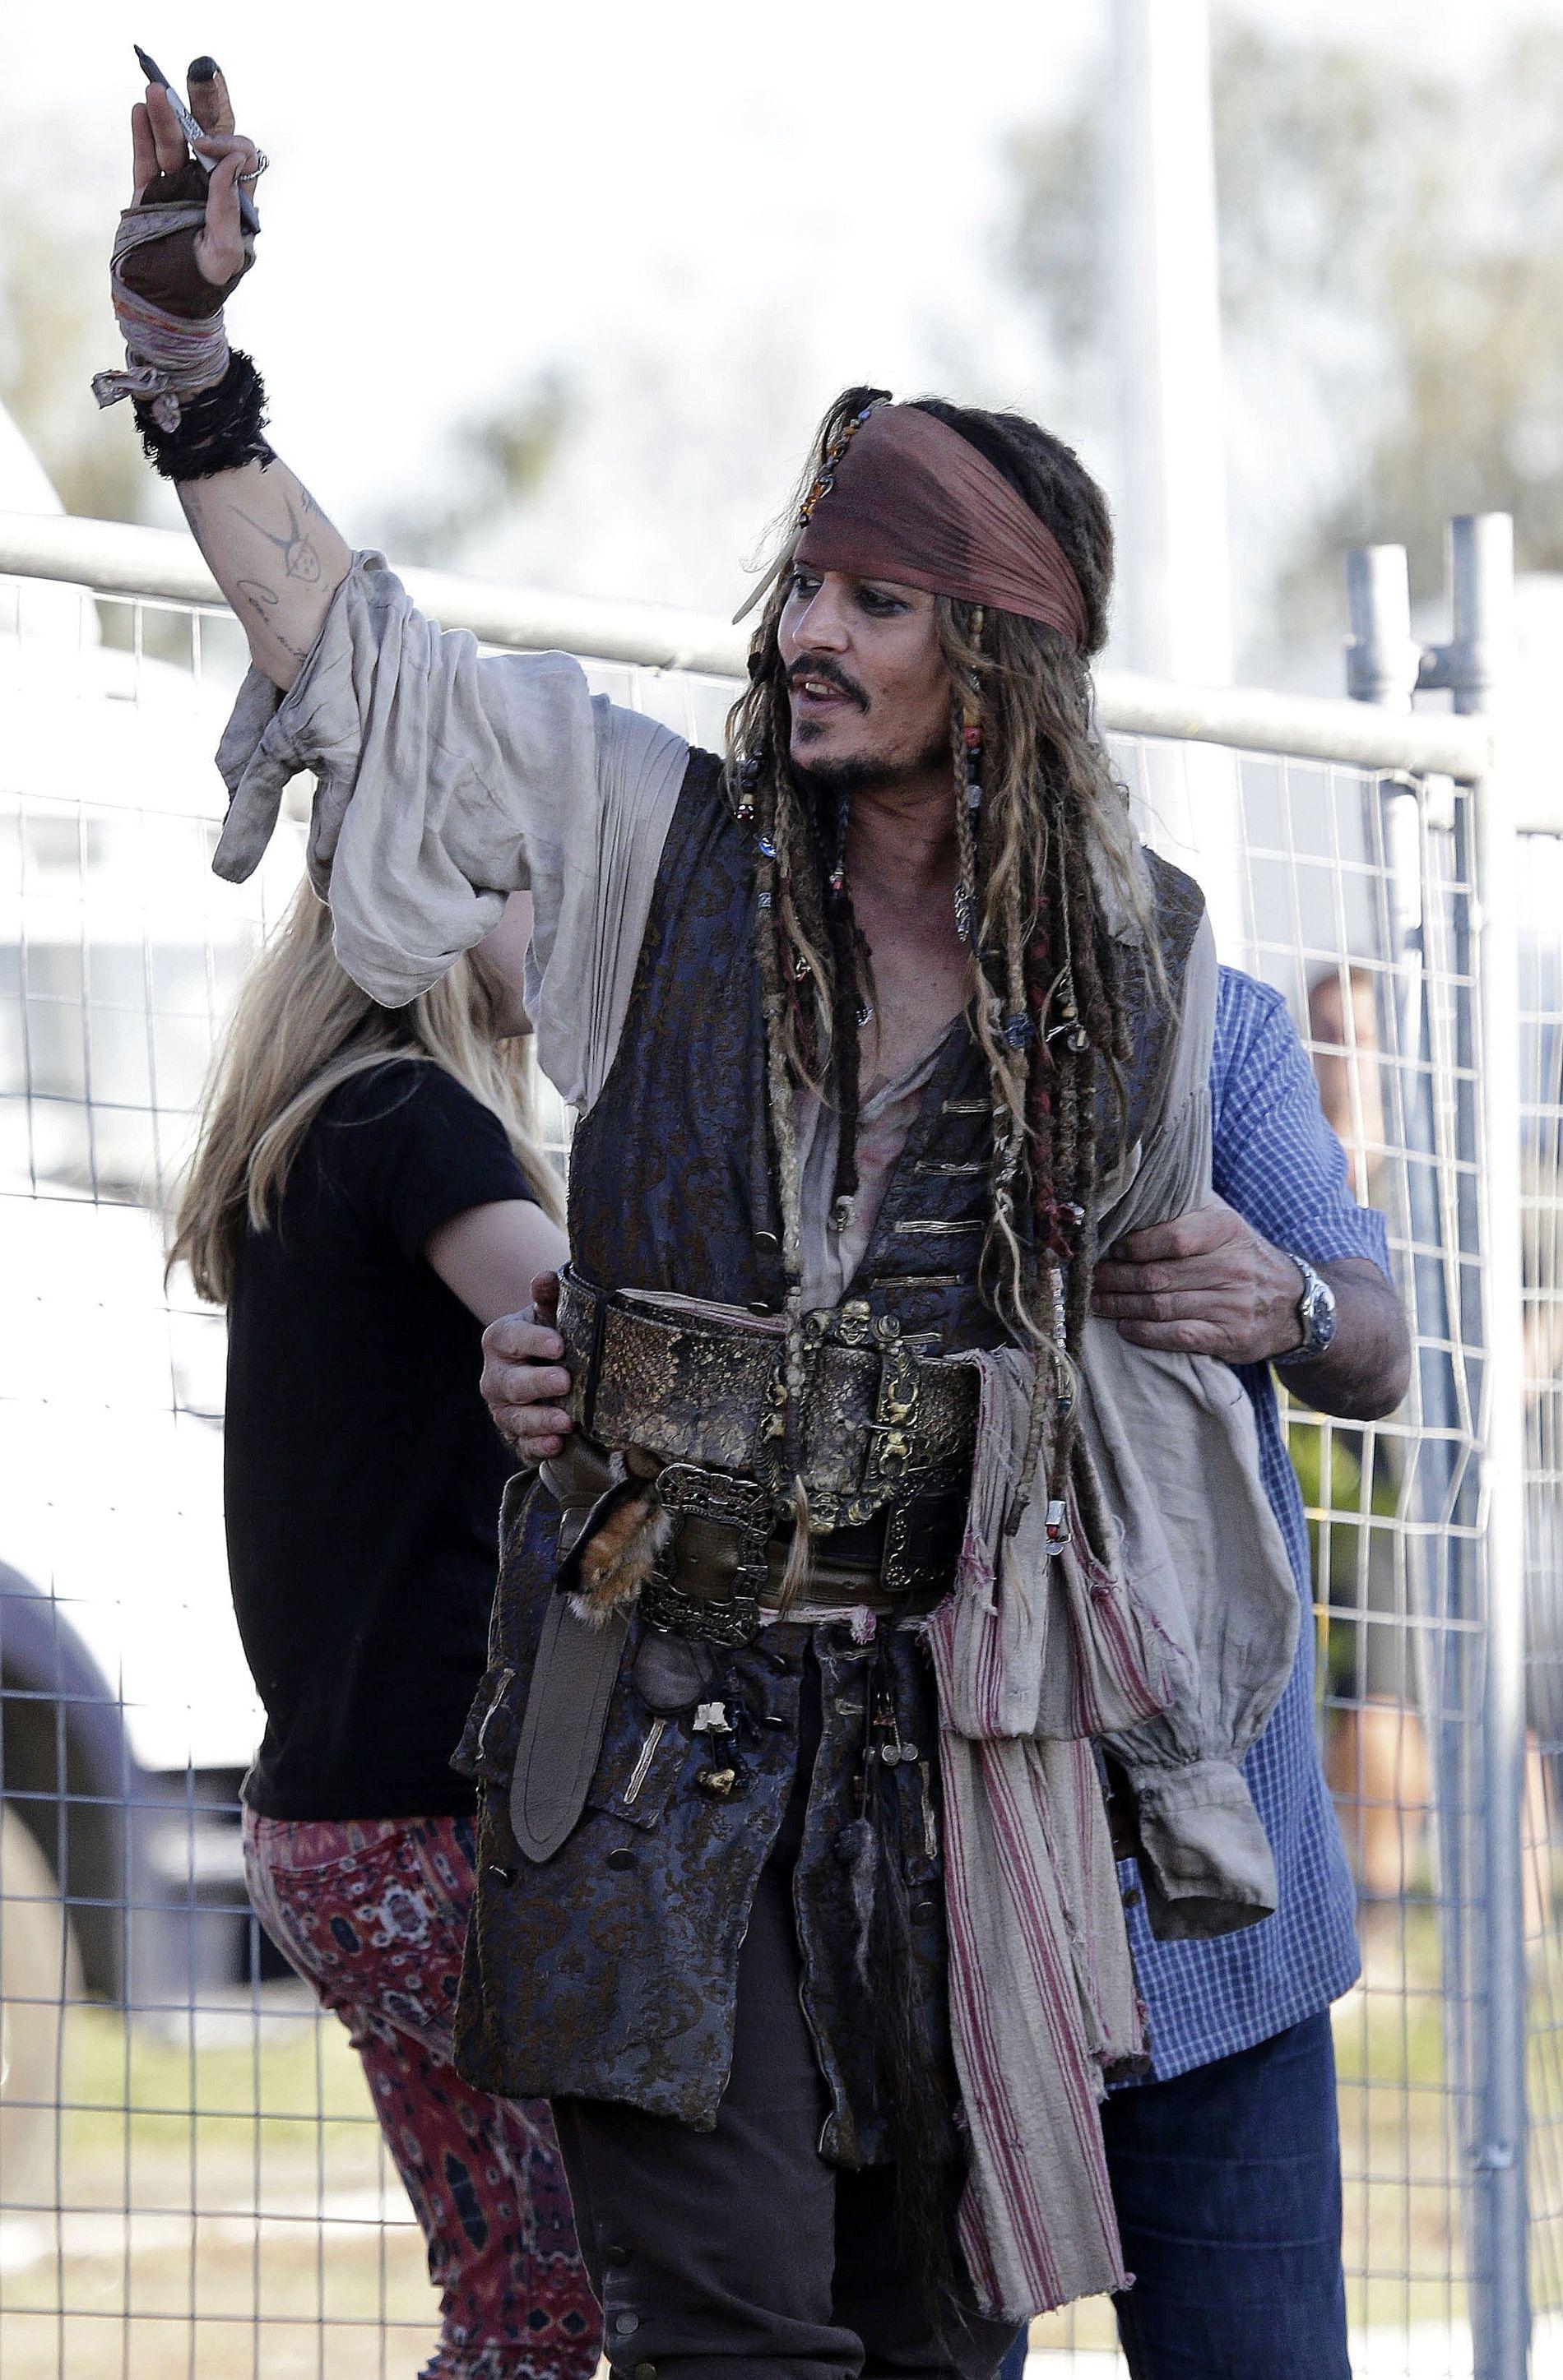 POPULÆR: Johnny Depp i Jack Sparrows karakter vinker til fans etter en dag på settet i Brisbane i Australia i fjor sommer.